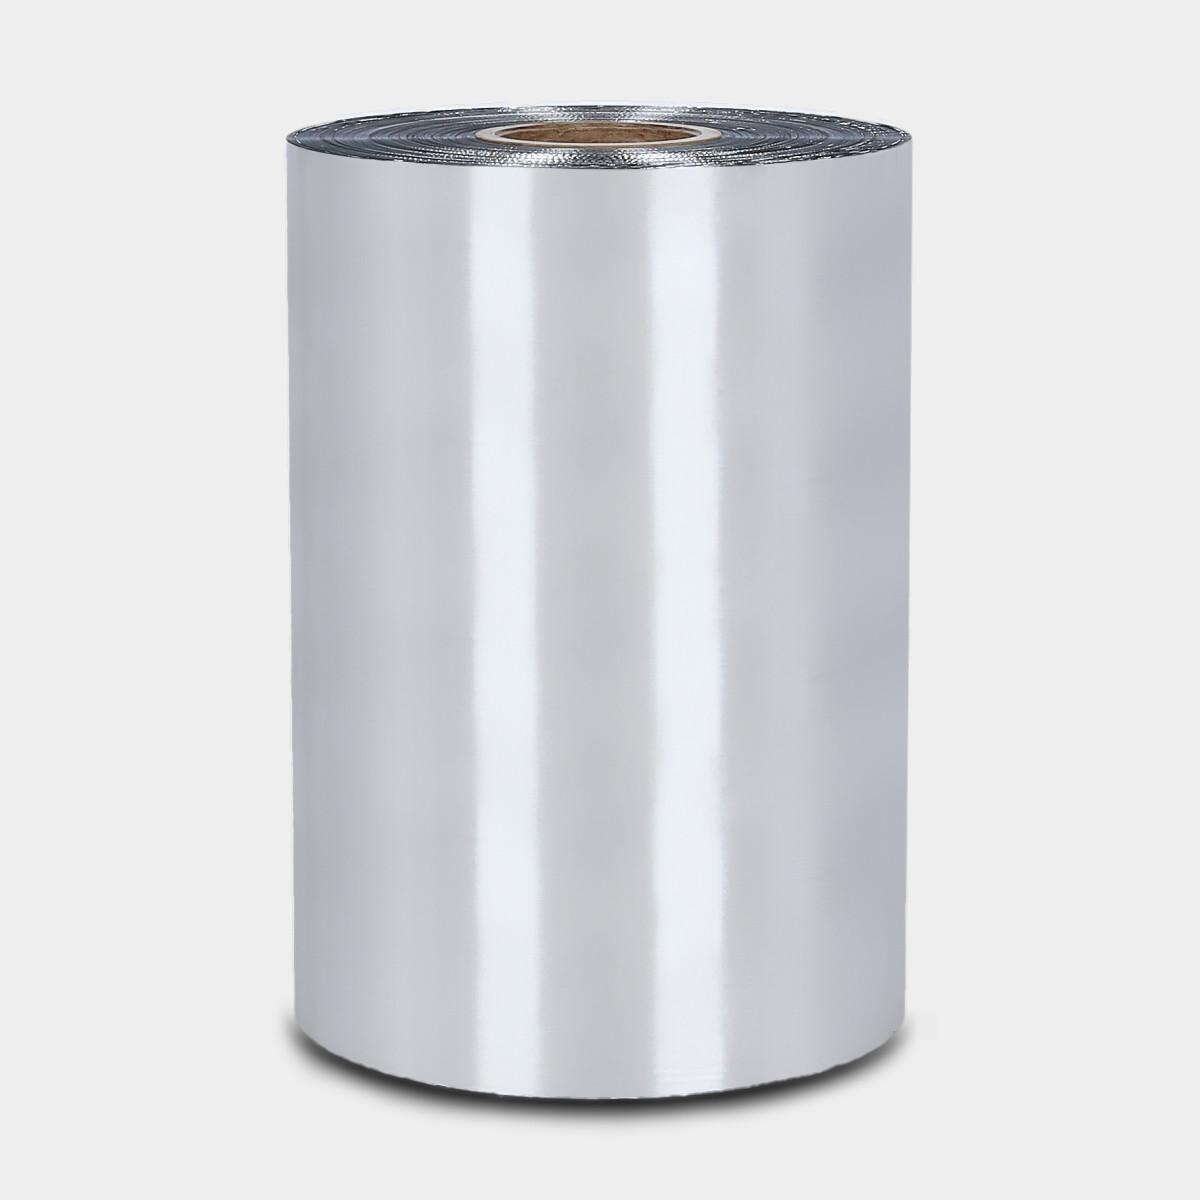 Pet termal folija silver 22my/500mm